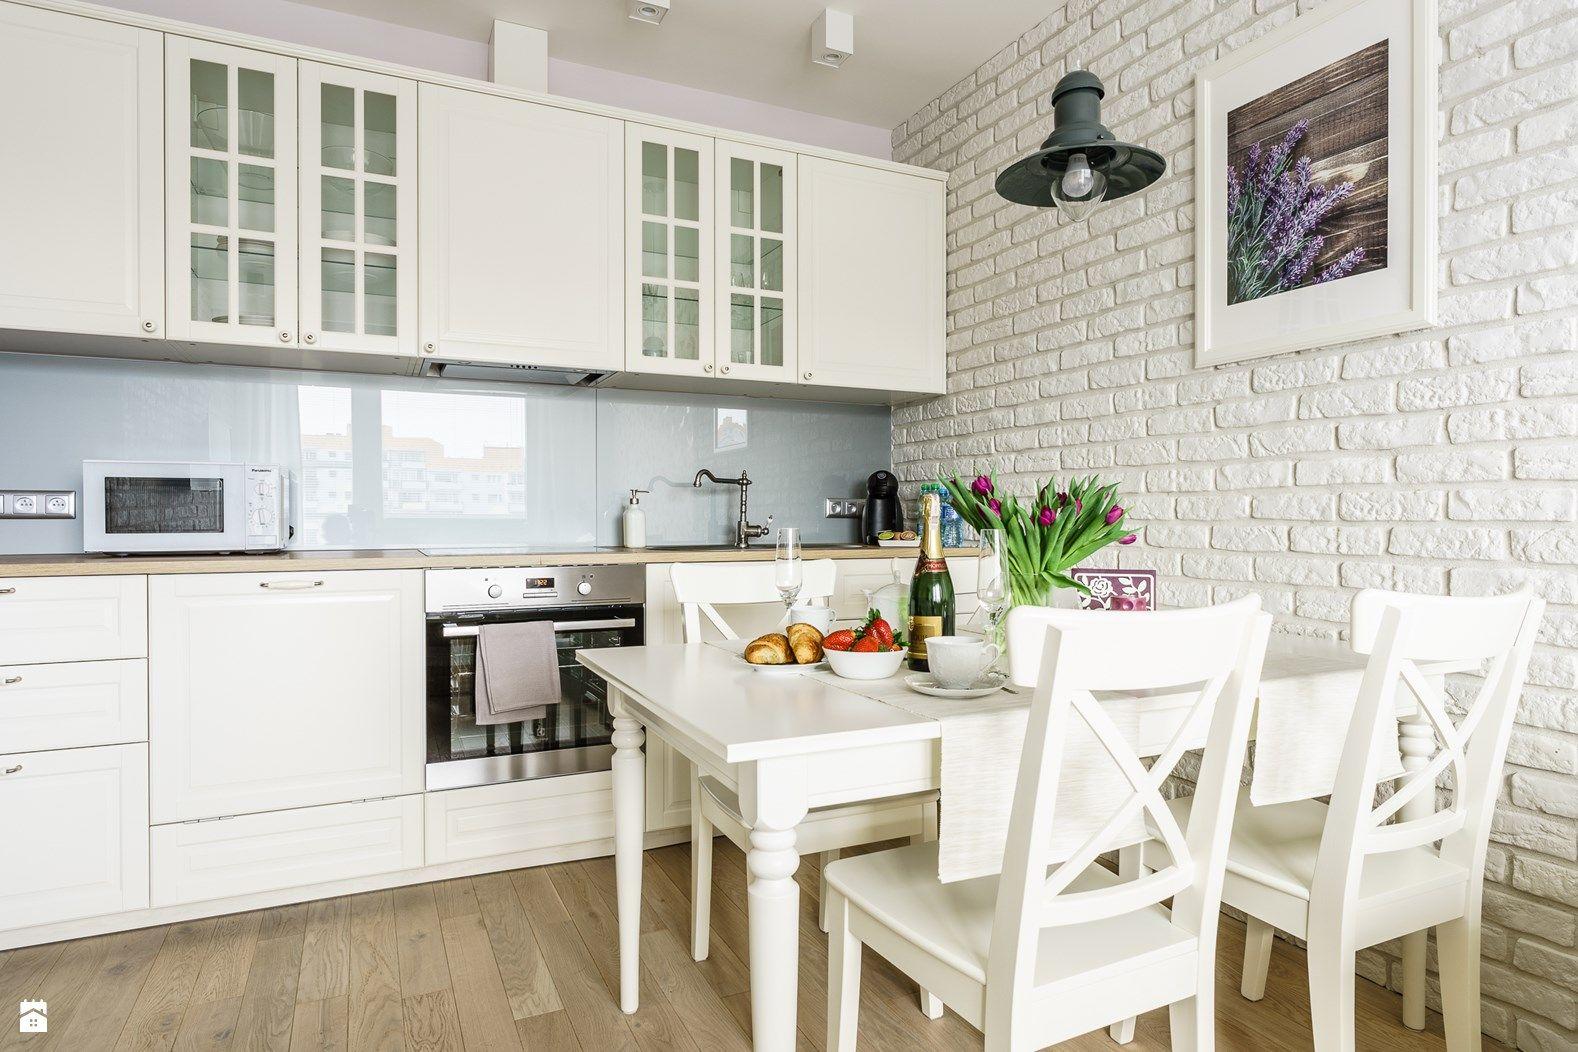 Apartament Prowansalski Aviator Gdansk Kuchnia Styl Prowansalski Zdjeci Open Concept Kitchen Living Room Living Room And Kitchen Design Kitchen Layout